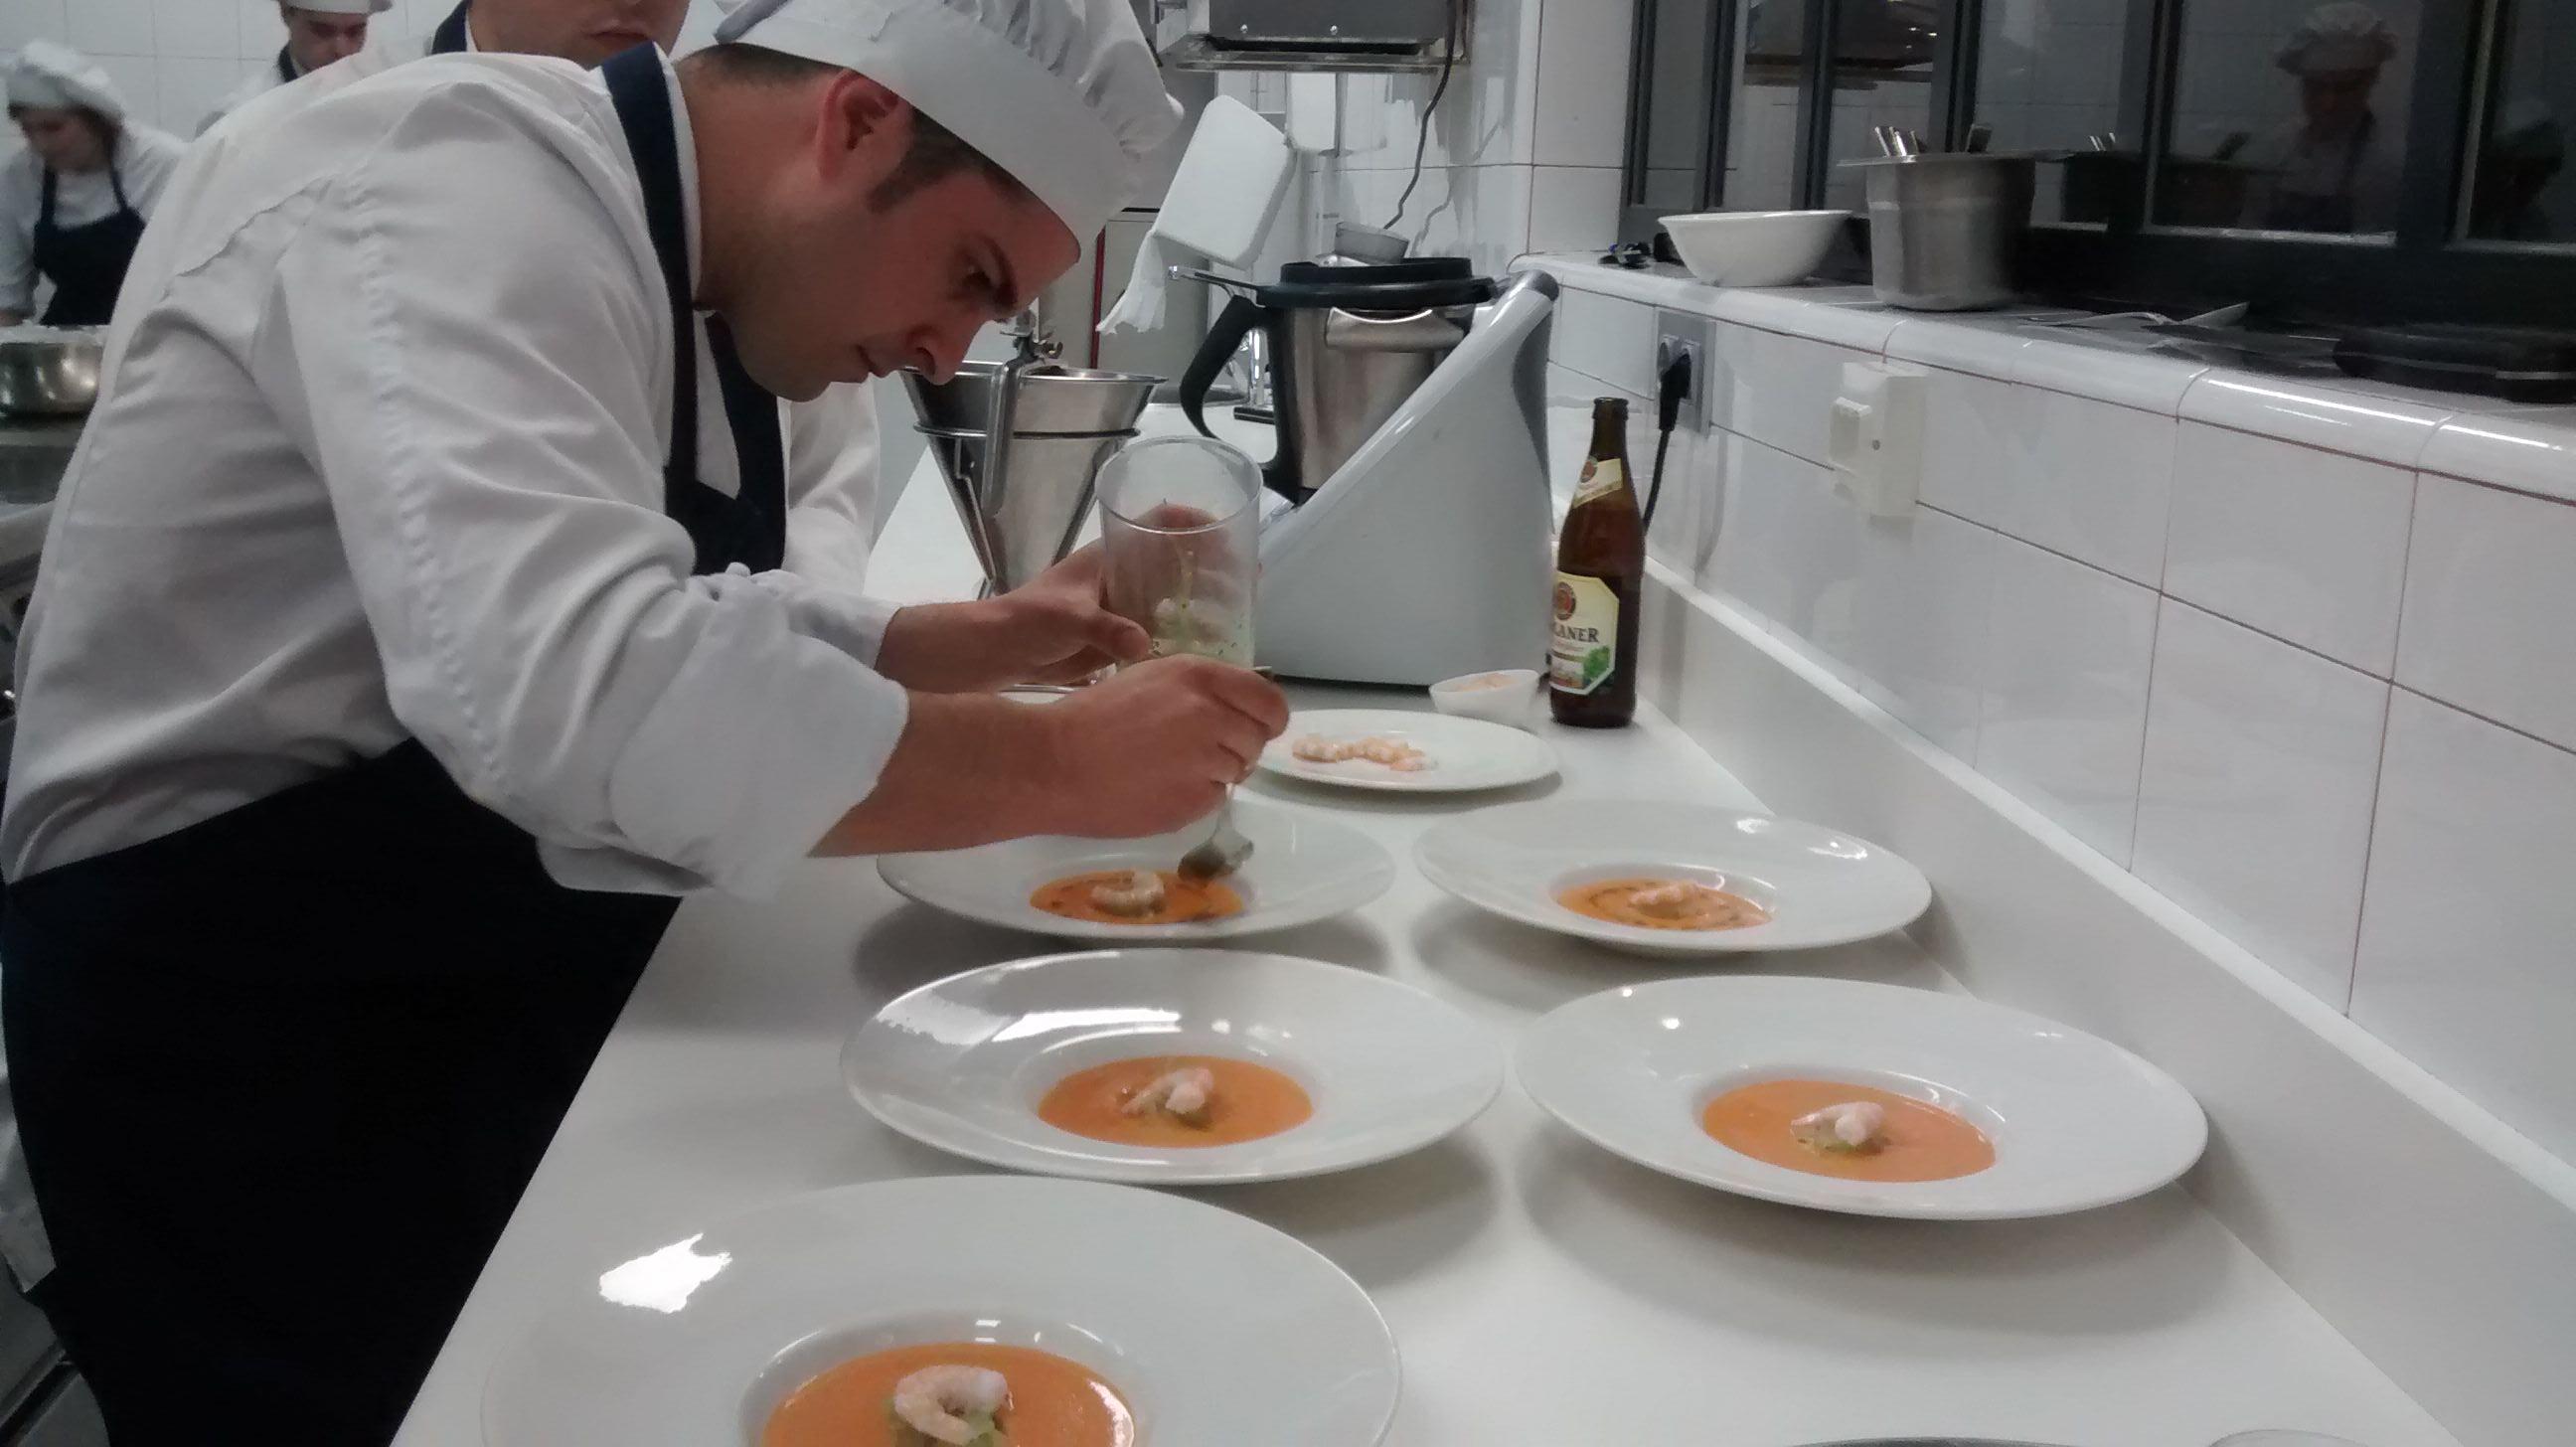 Talentchef semifinal en la escuela de hosteler a - Sartenes chef la cartuja de sevilla ...